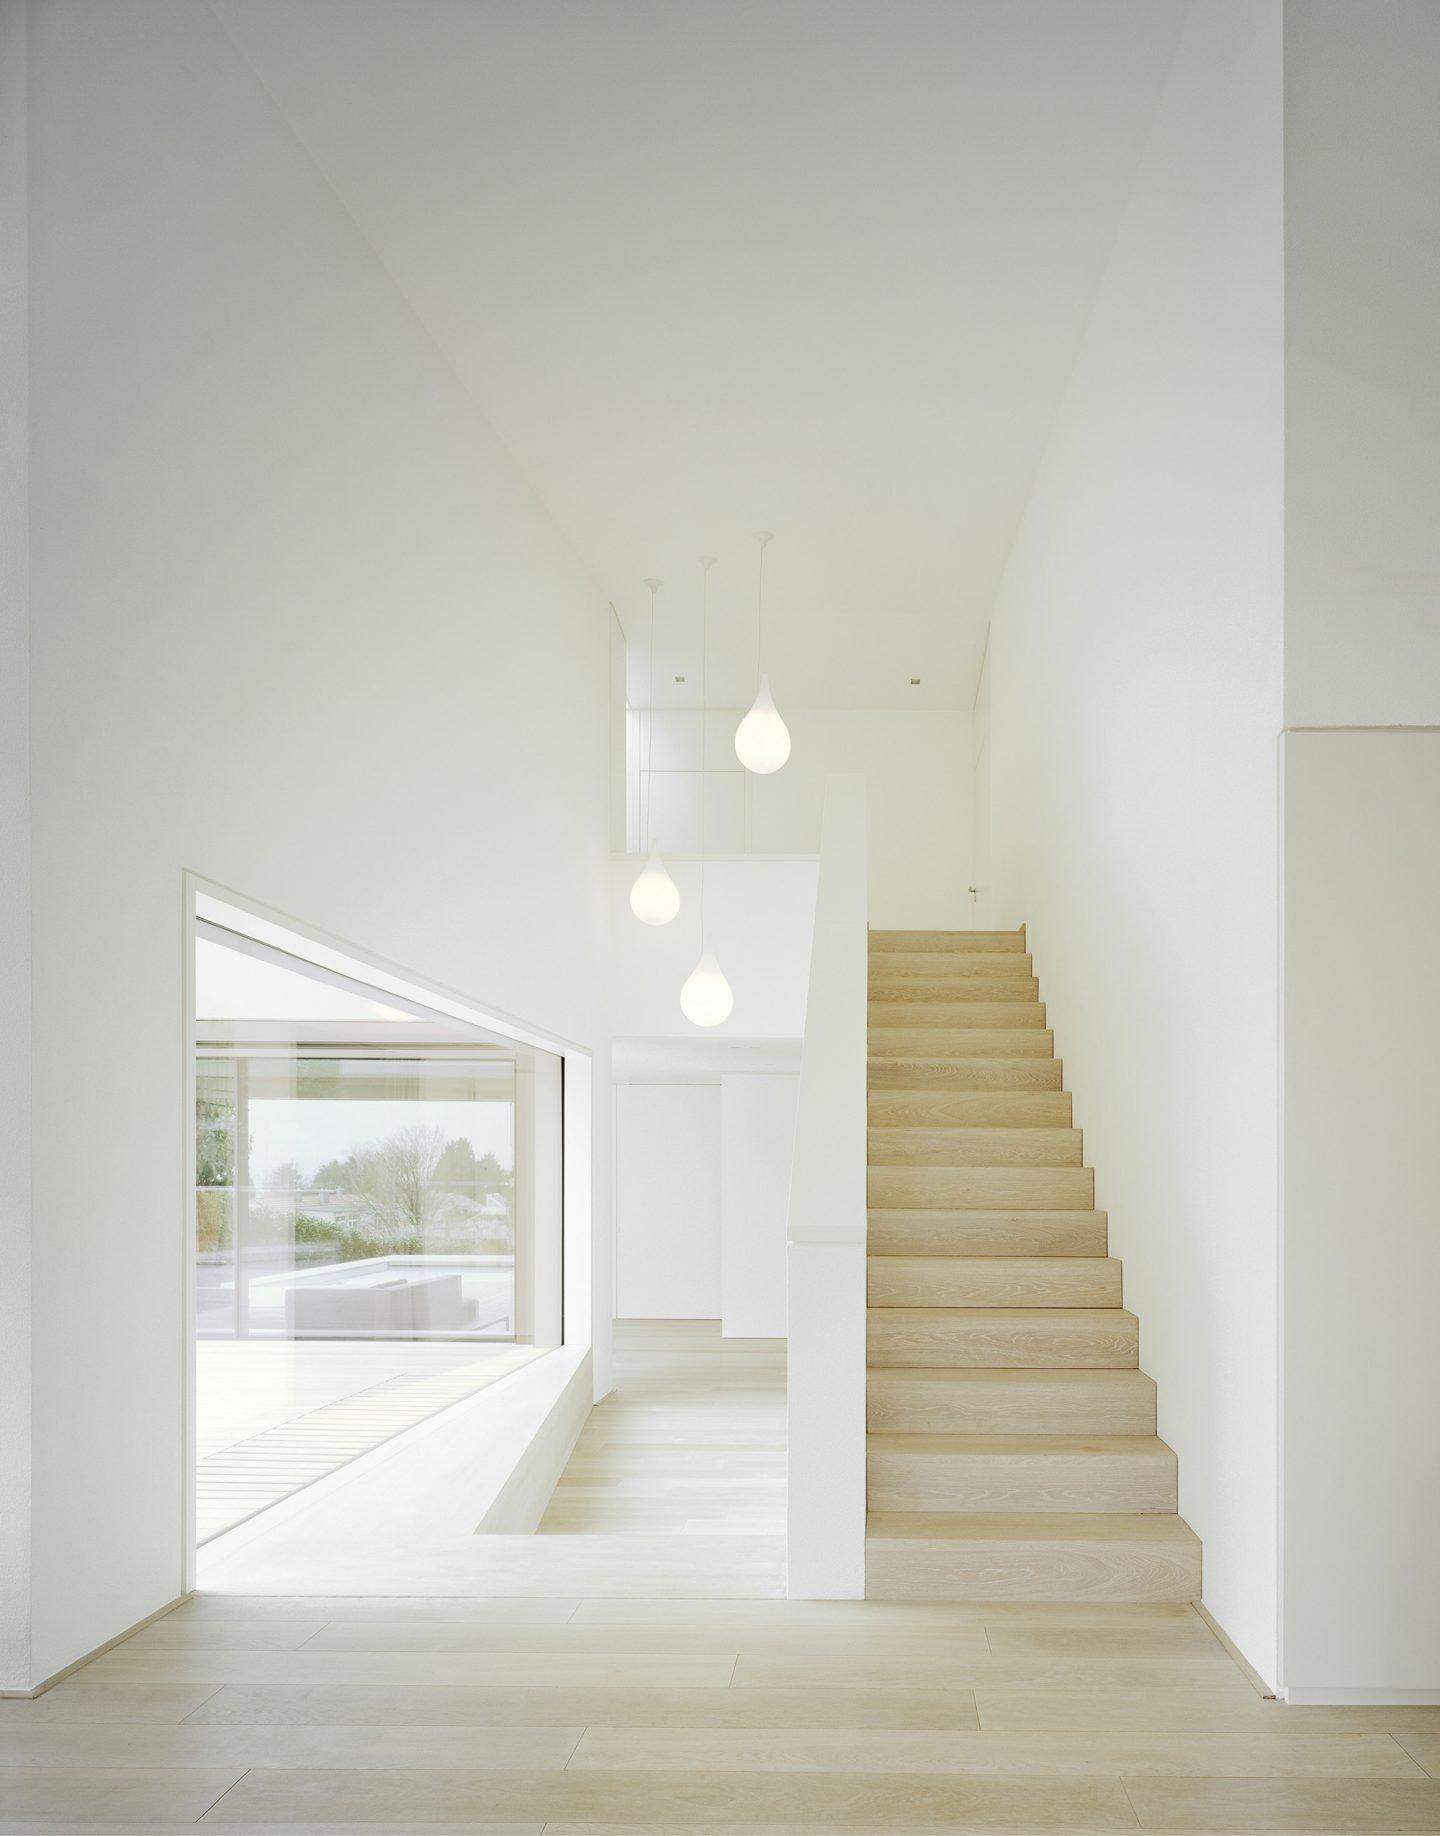 IGNANT-Architecture-Steimle-Architekten-S3-City-Villa-02